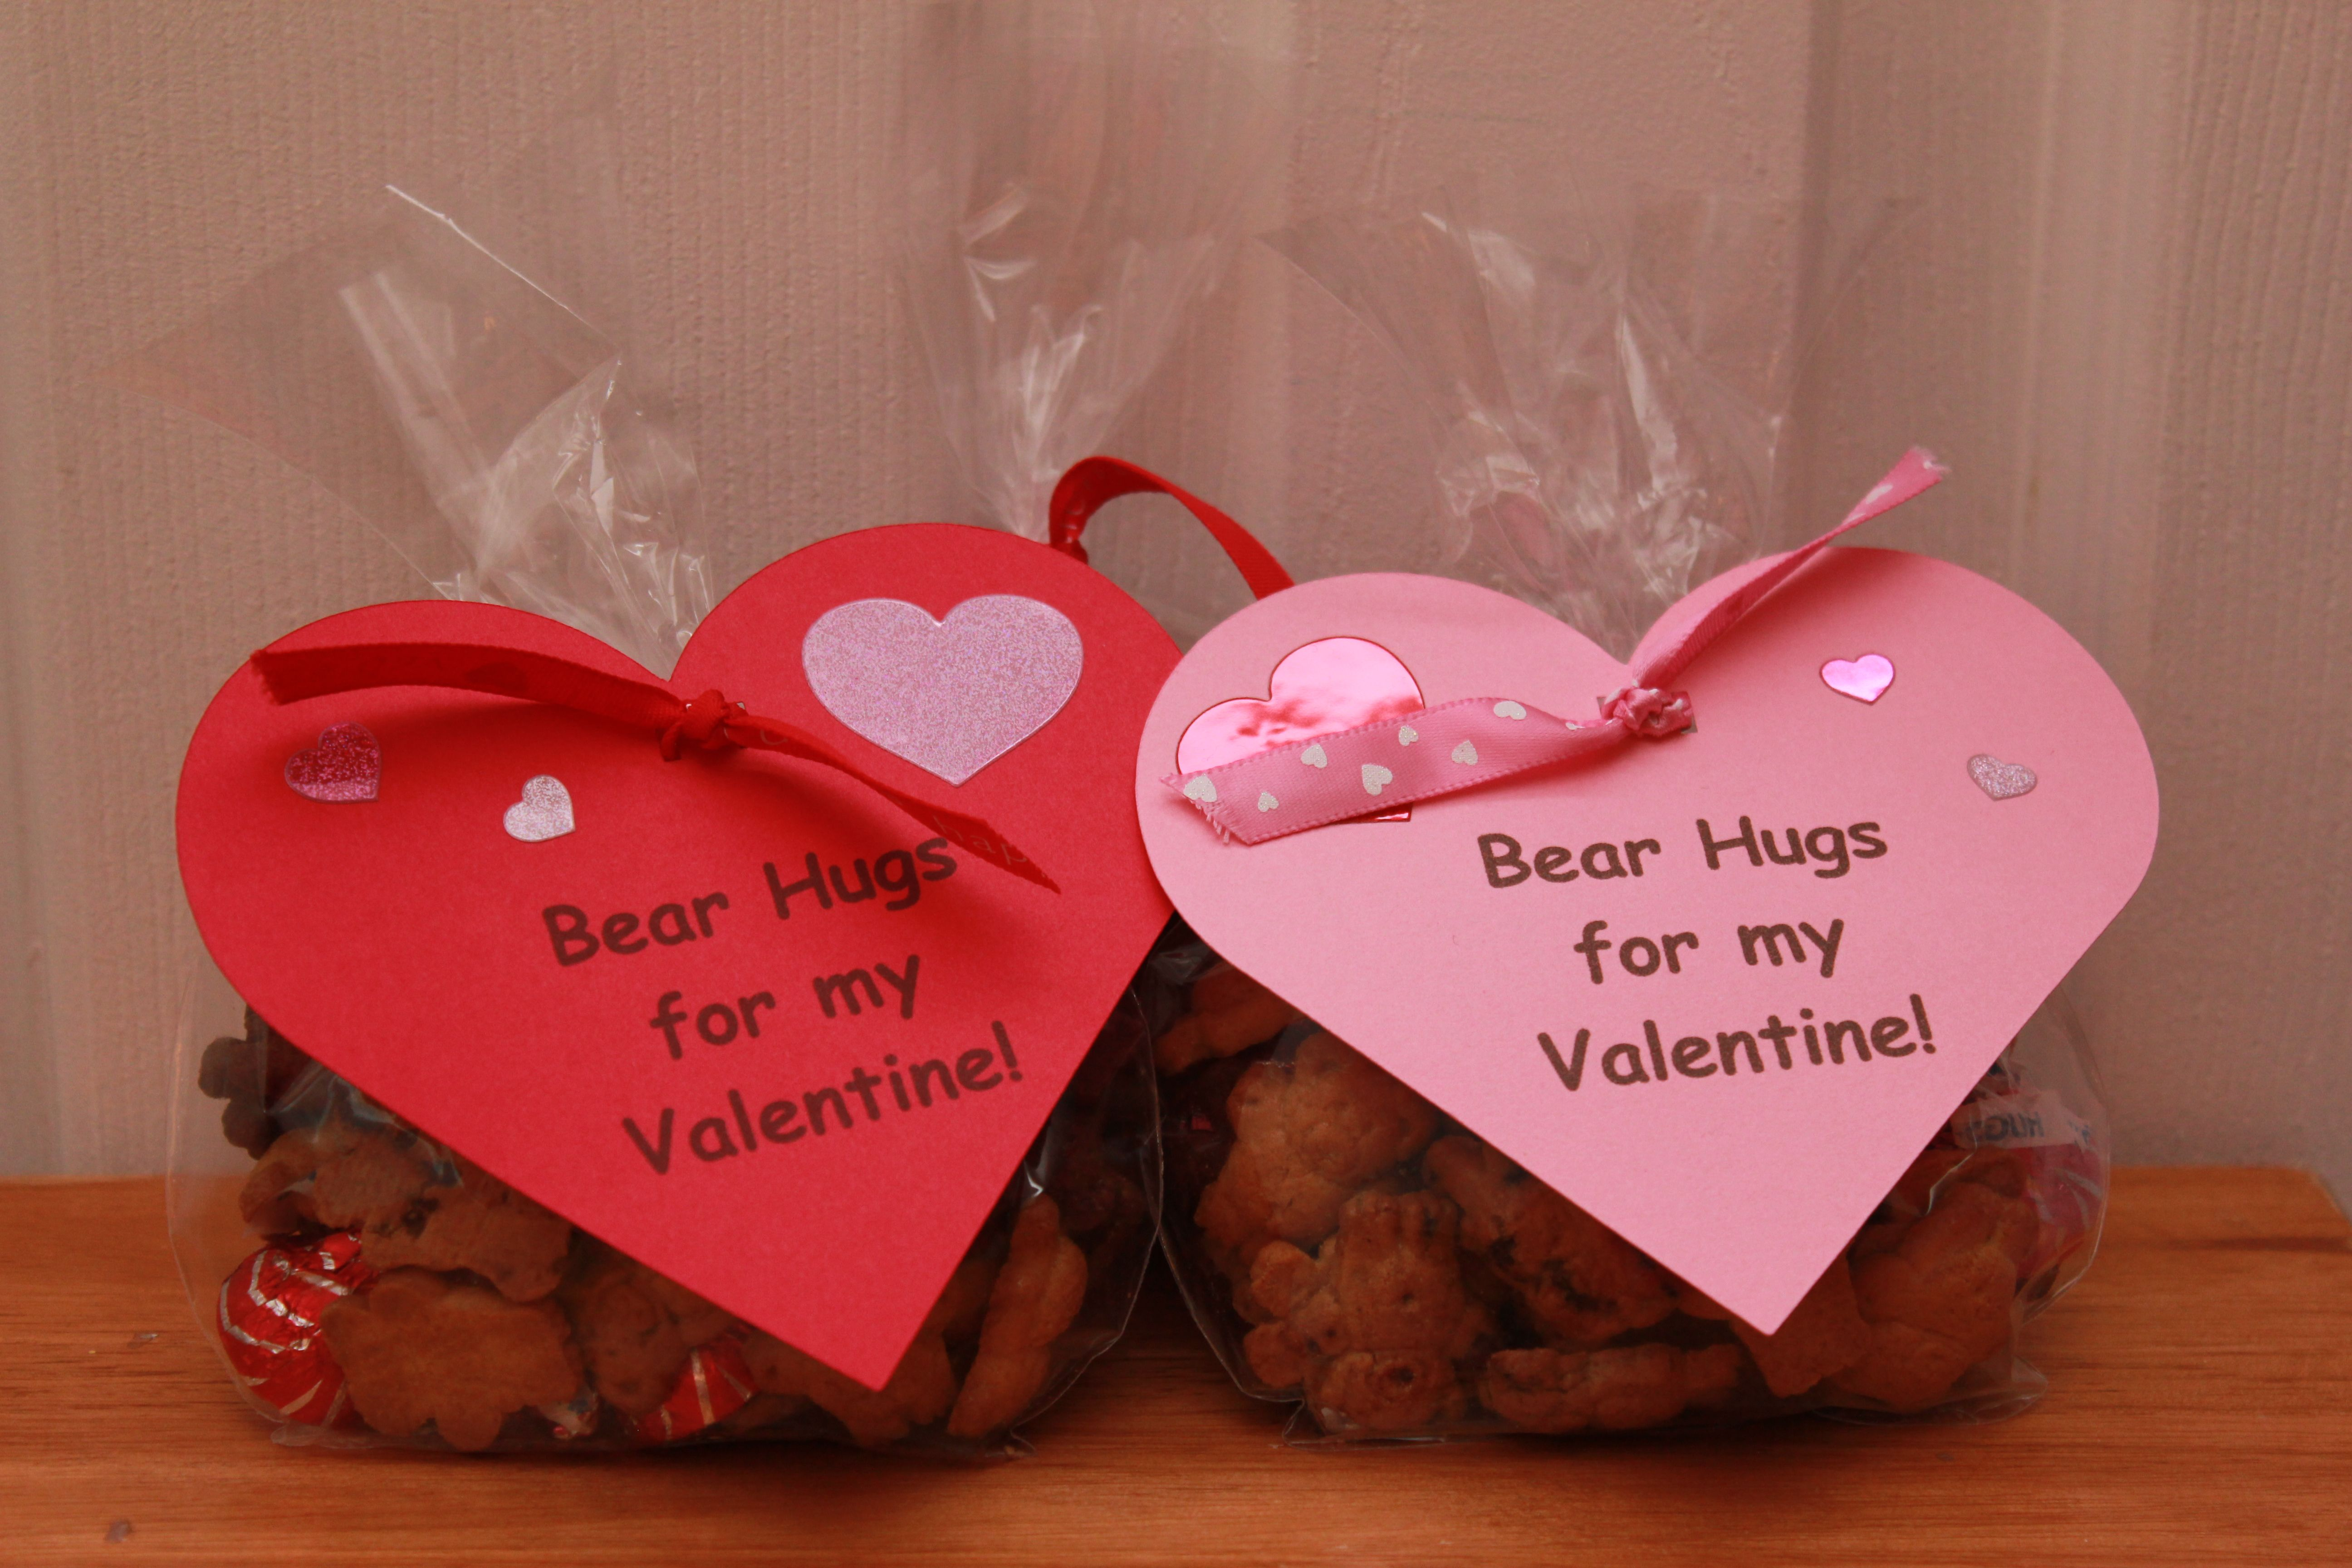 Scout S Valentines For School Bear Hugs Teddy Grahams